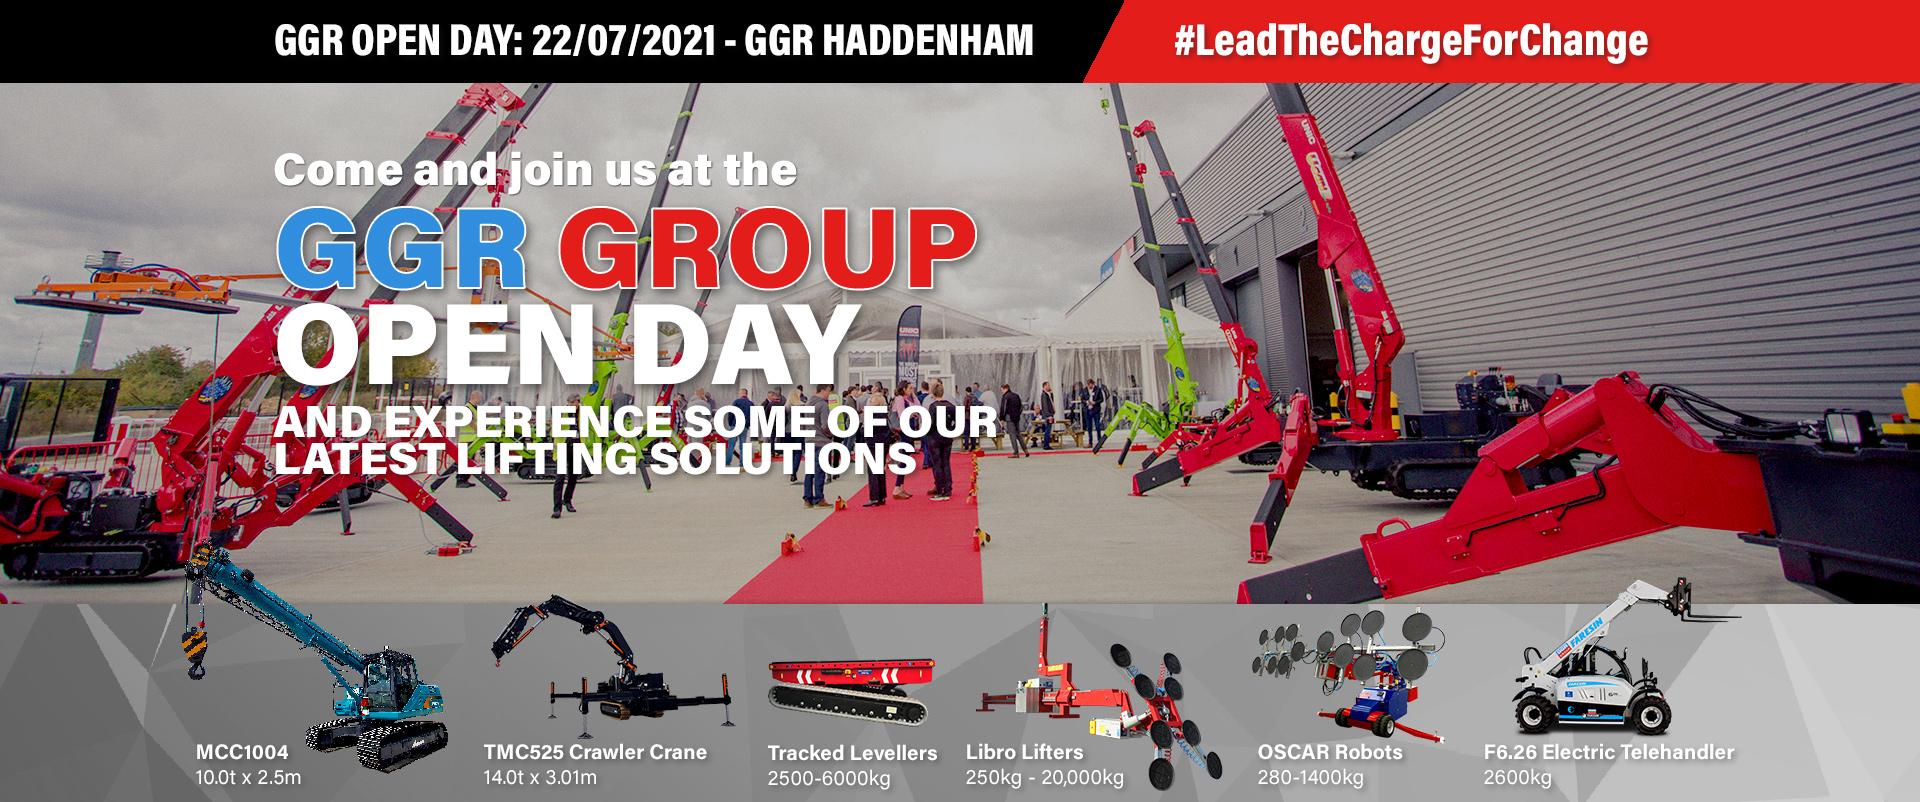 GGR-Group---Open-Day-Header